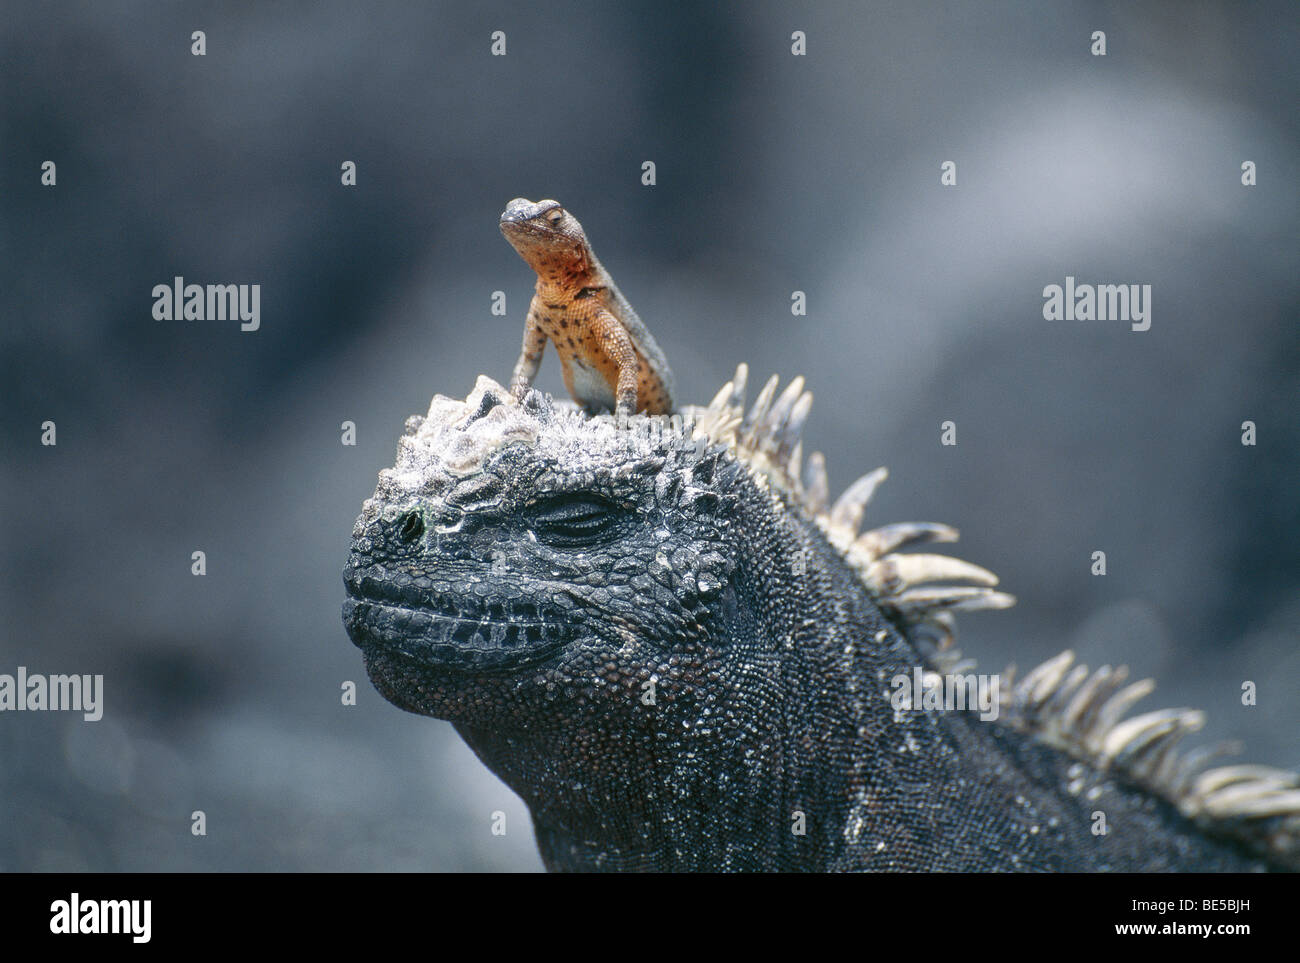 Lizard sitting on a marine iguana, Galapagos Islands, Ecuador, South America - Stock Image